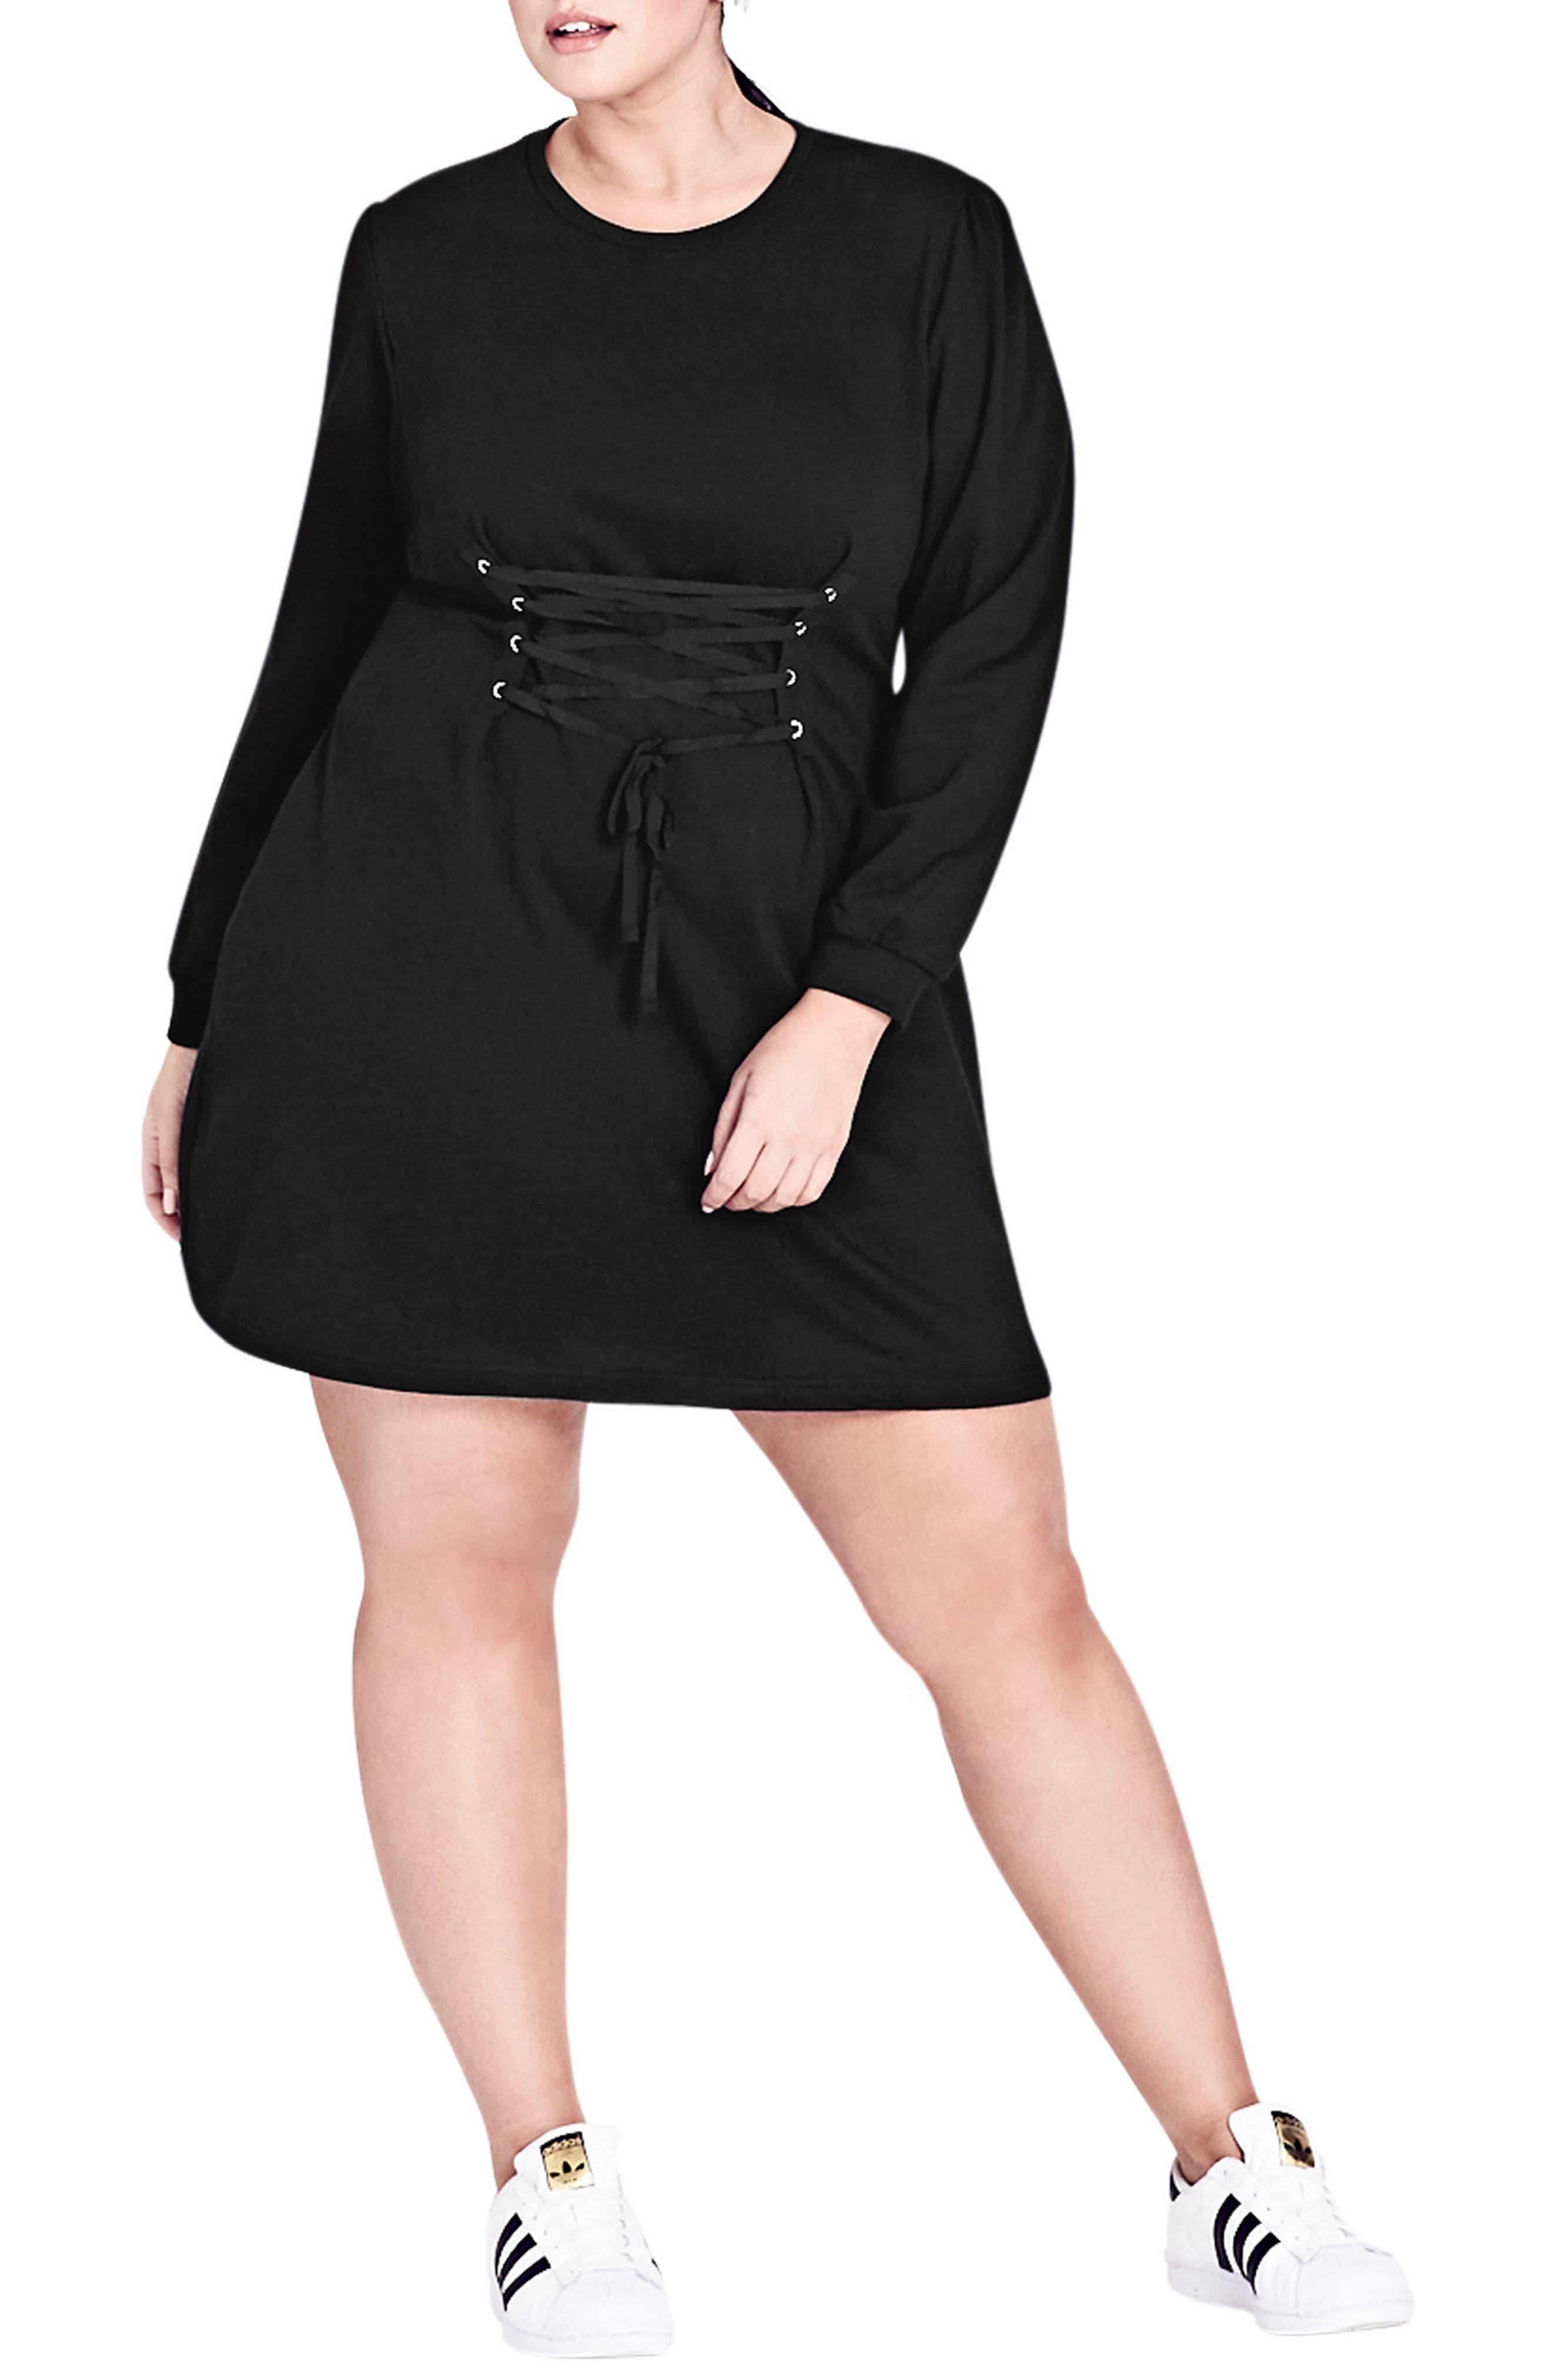 CITY CHIC Corset Waist Tunic Dress, Main, color, 001